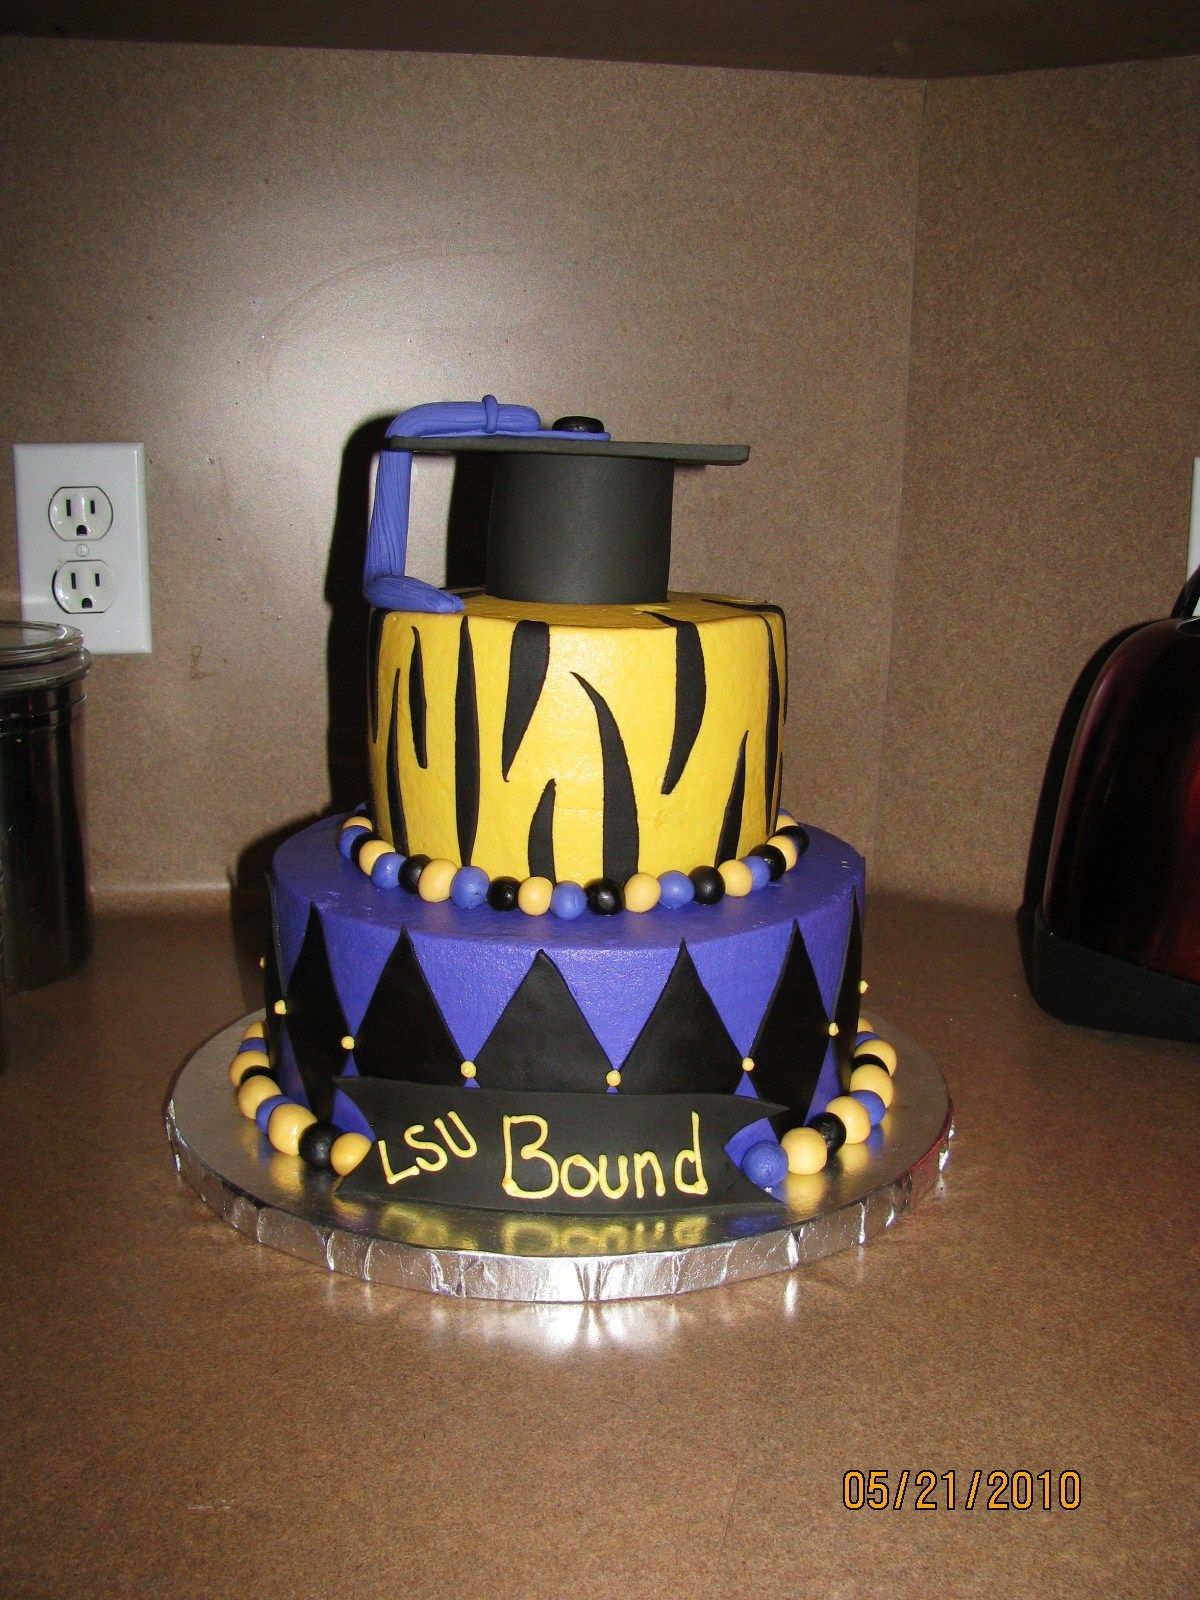 Lsu Graduation Cake 9 And 6 Inch Cakes Buttercream W Fondant